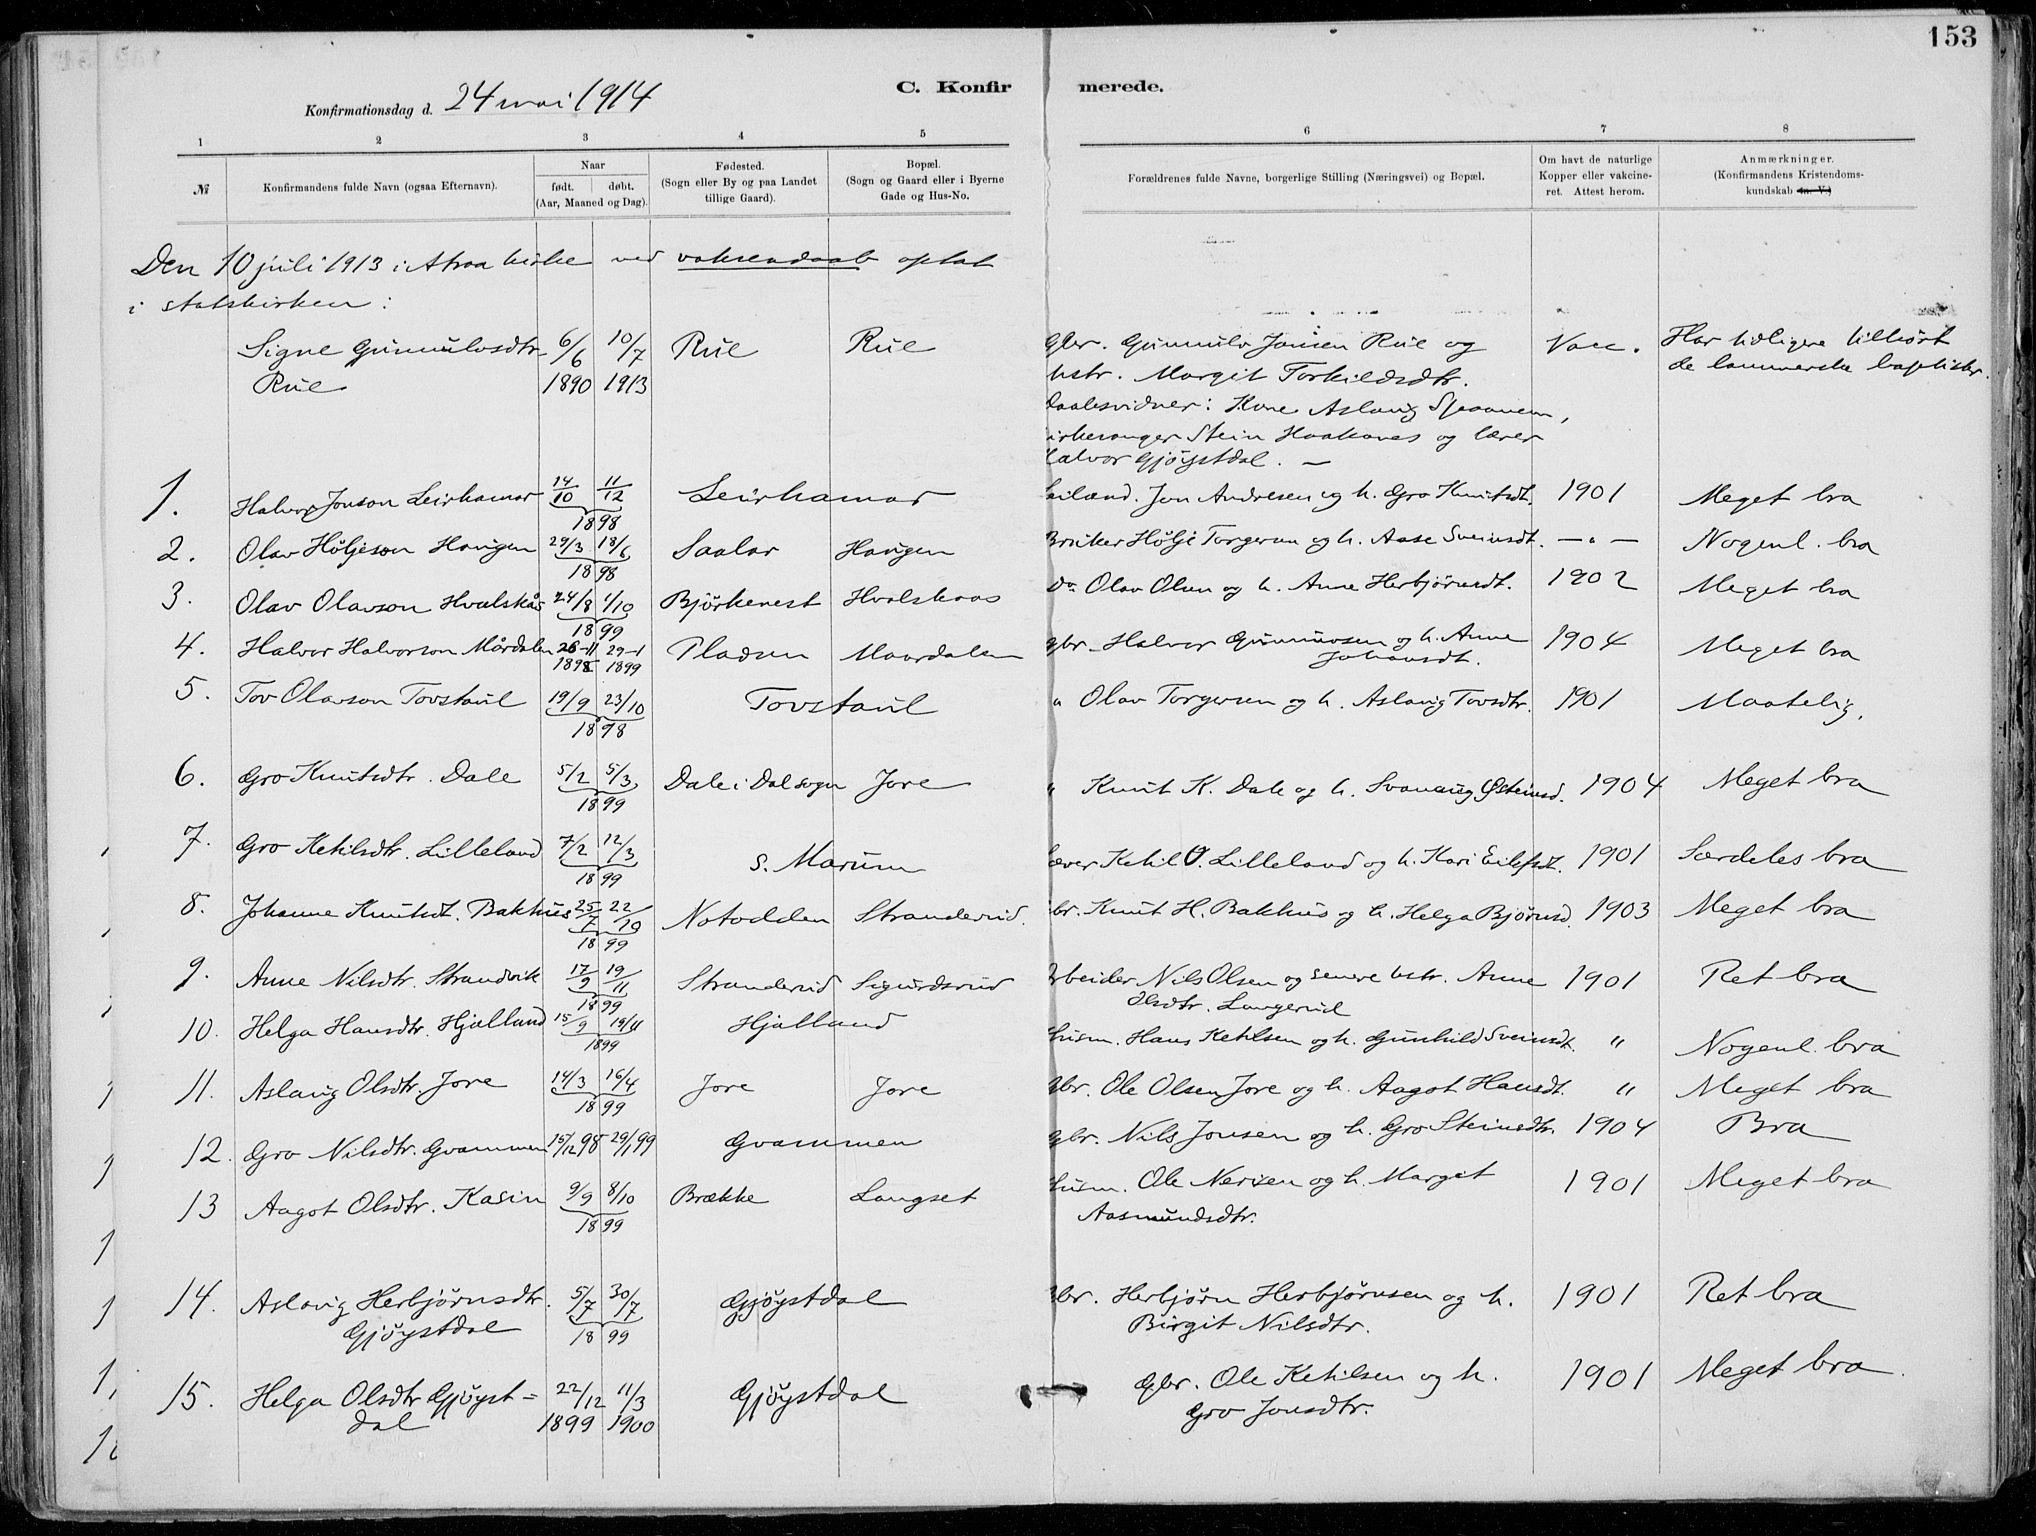 SAKO, Tinn kirkebøker, F/Fa/L0007: Ministerialbok nr. I 7, 1878-1922, s. 153